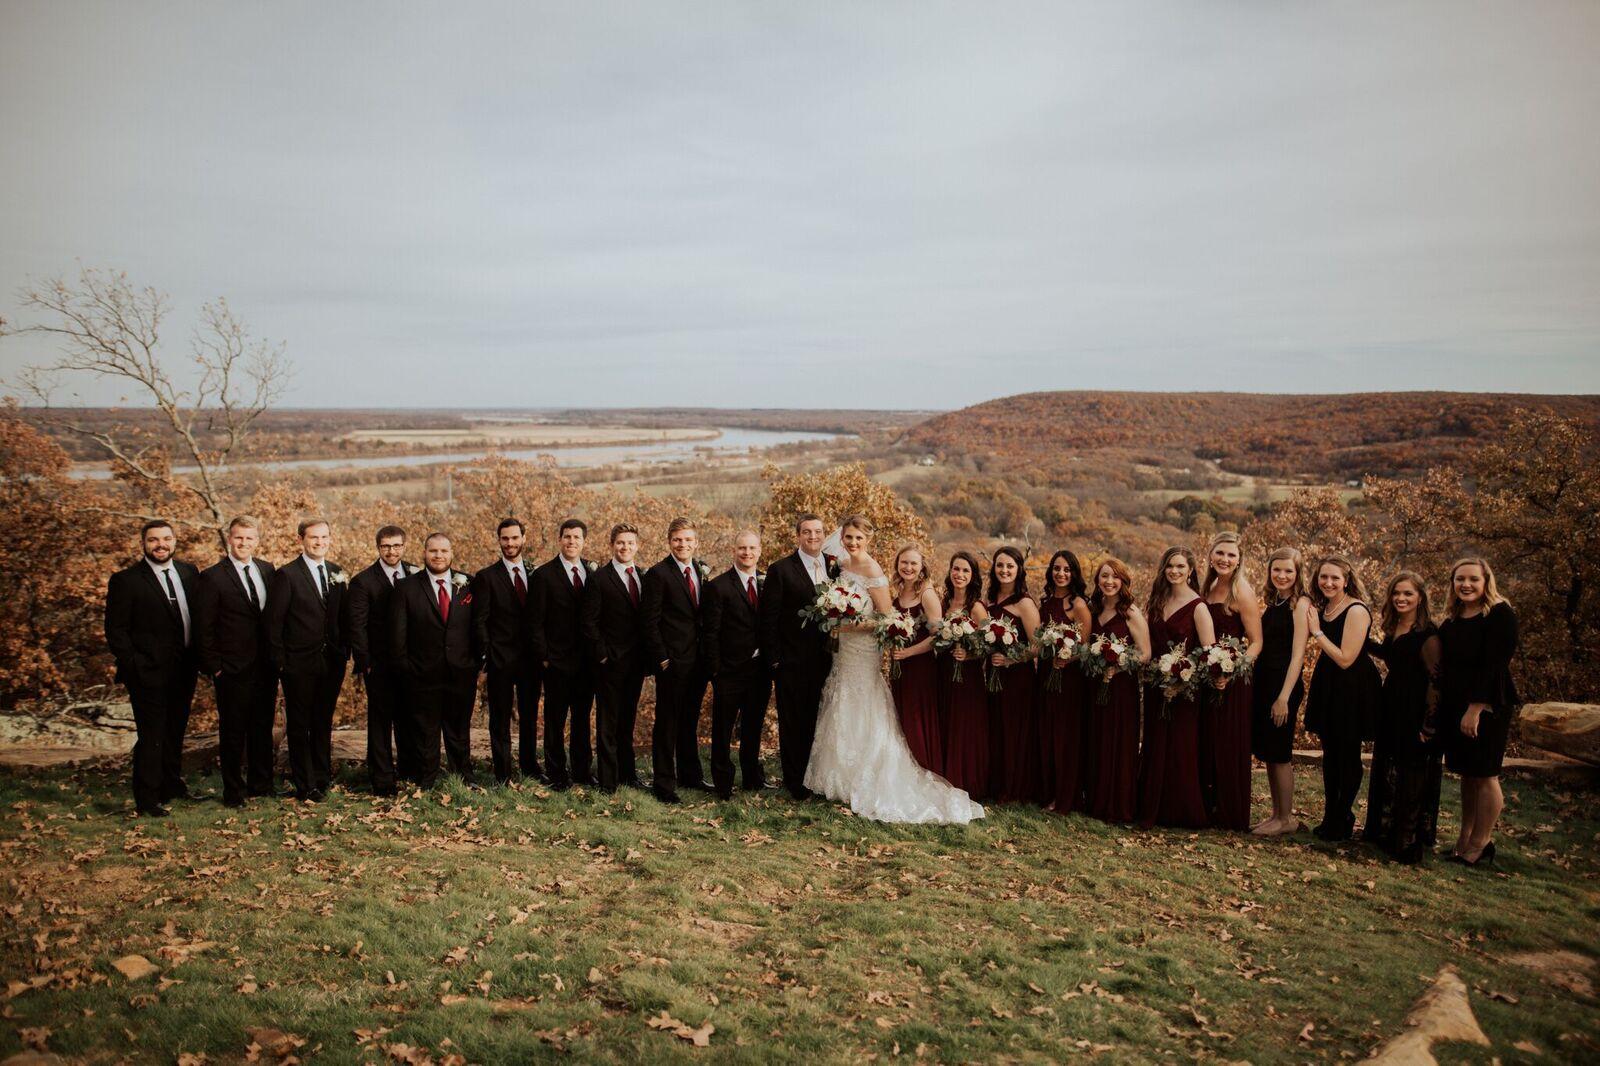 Tulsa Wedding Venue White Barn 11b.jpg